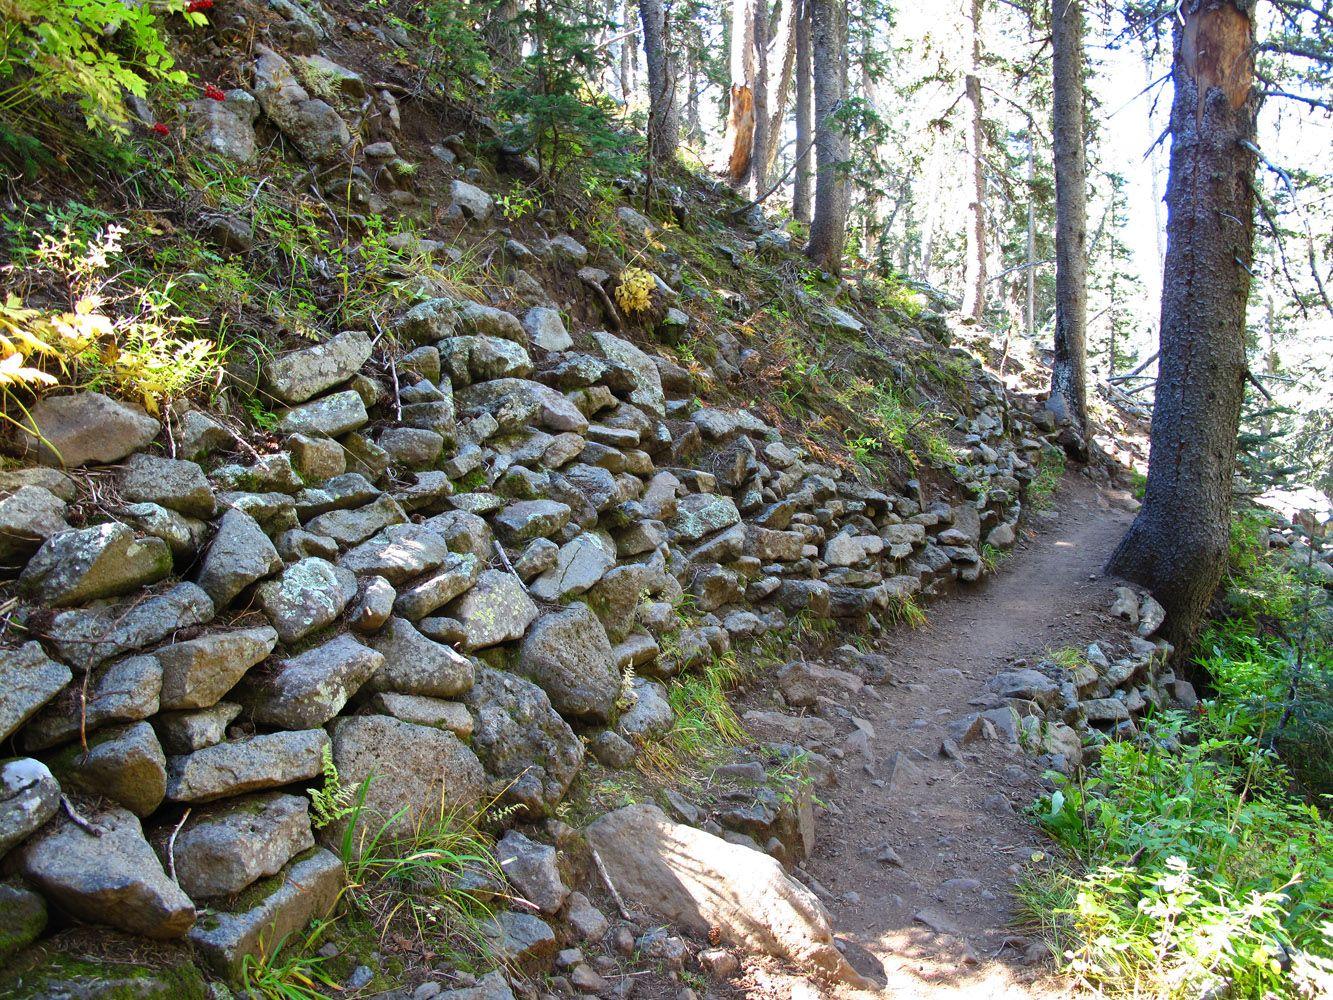 Walking uphill both ways